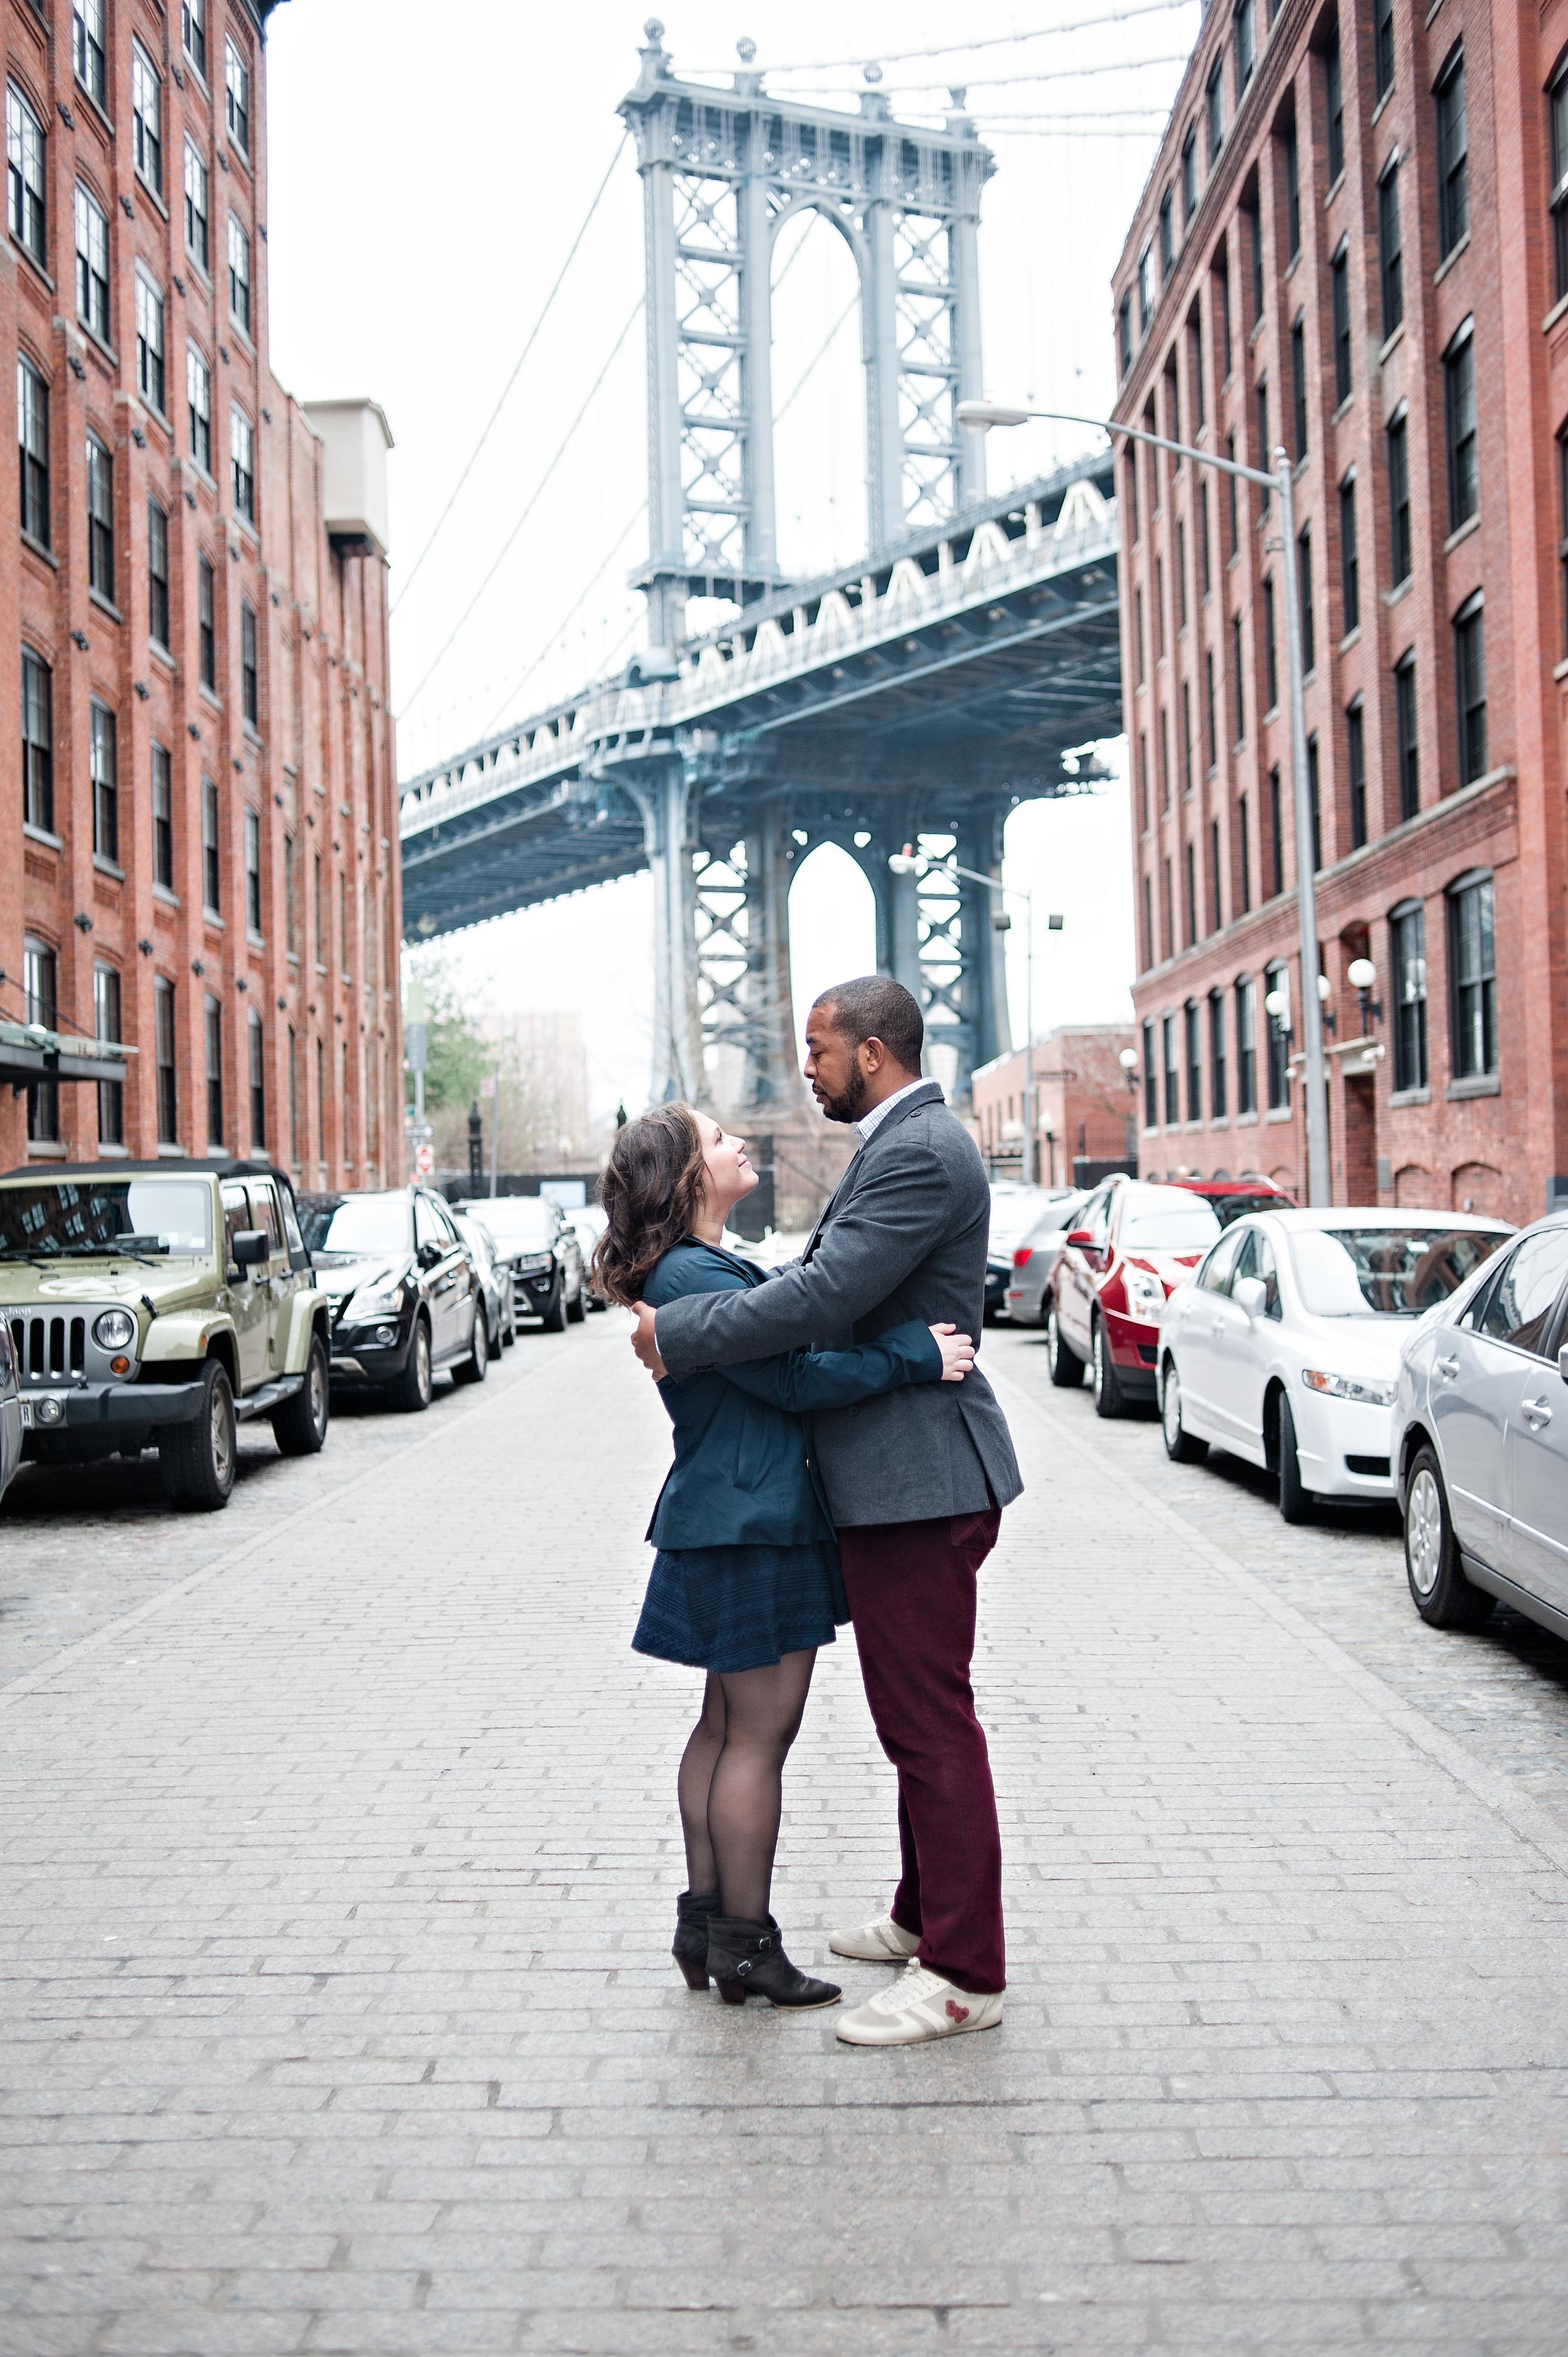 Brooklyn_Engagement_Session_DUMBO_HouseofLubold2